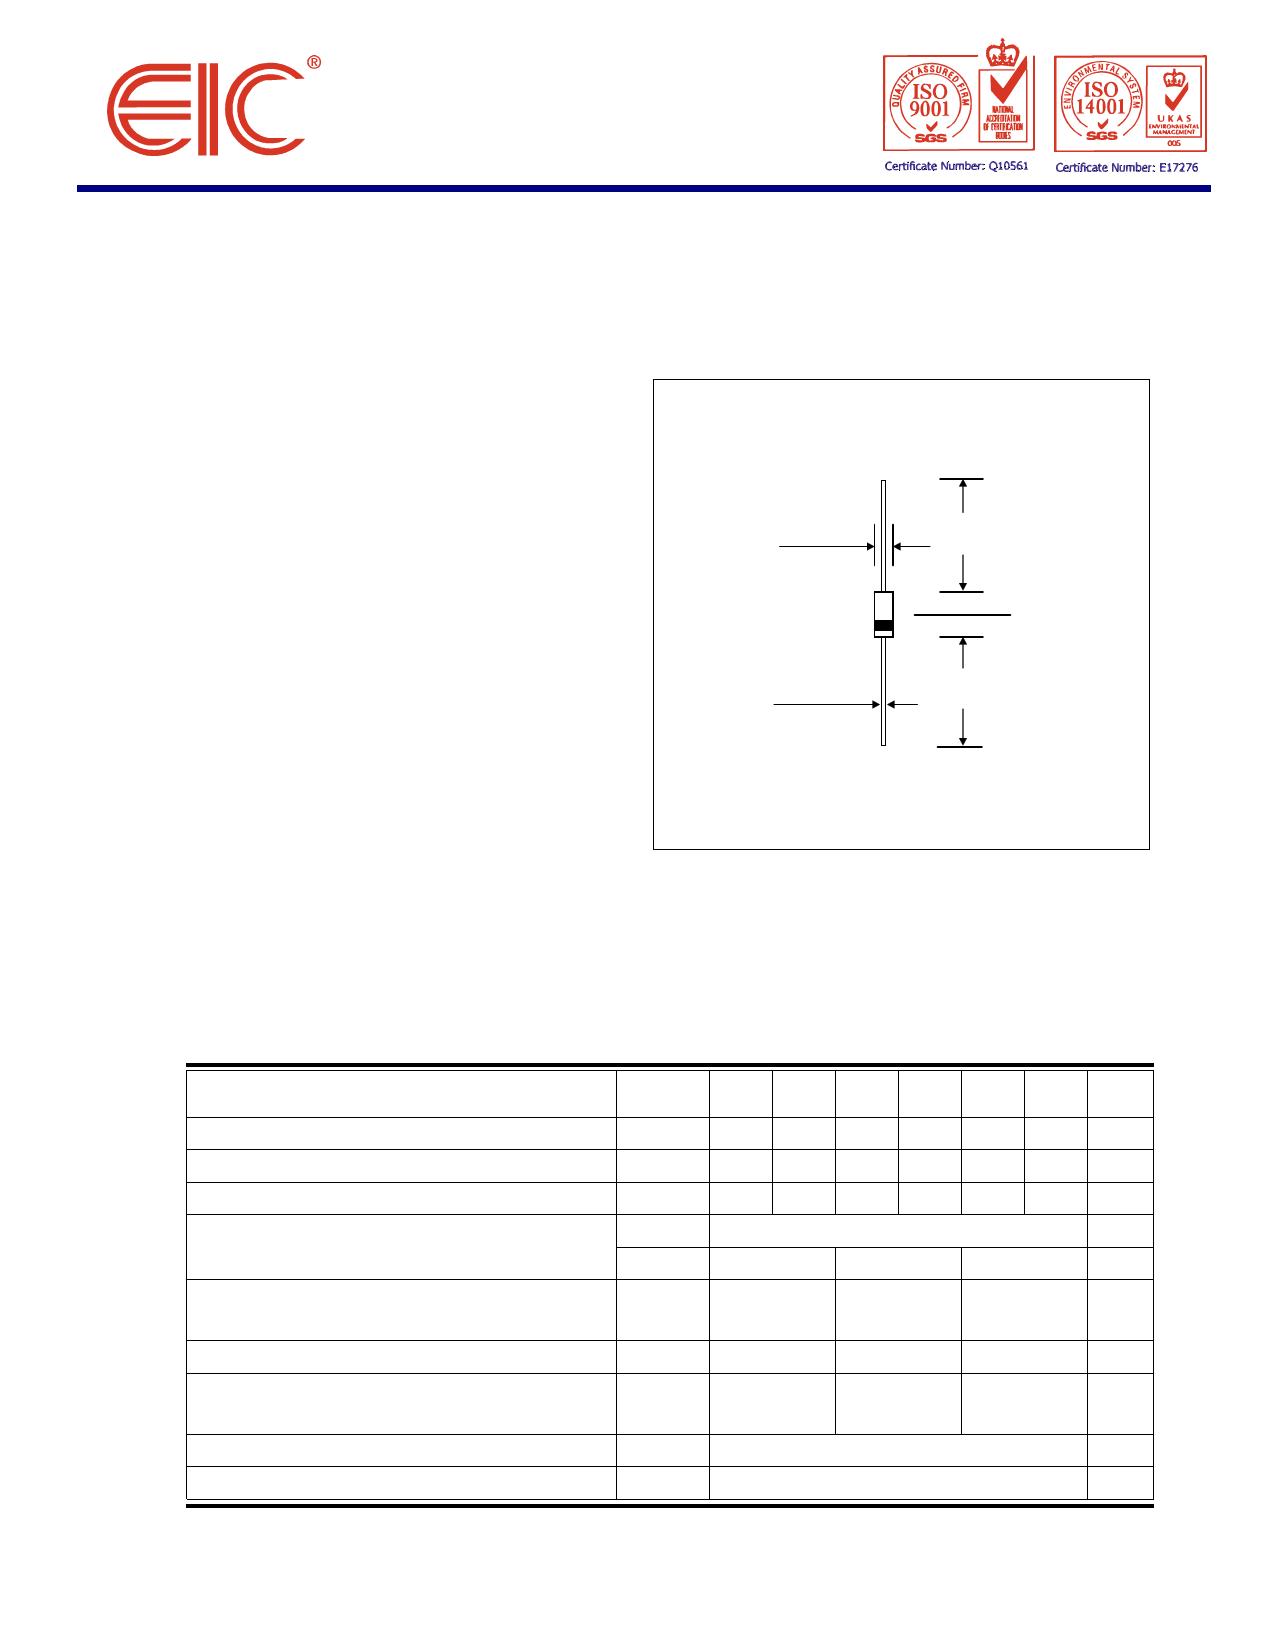 11DQ04 Datasheet, 11DQ04 PDF,ピン配置, 機能